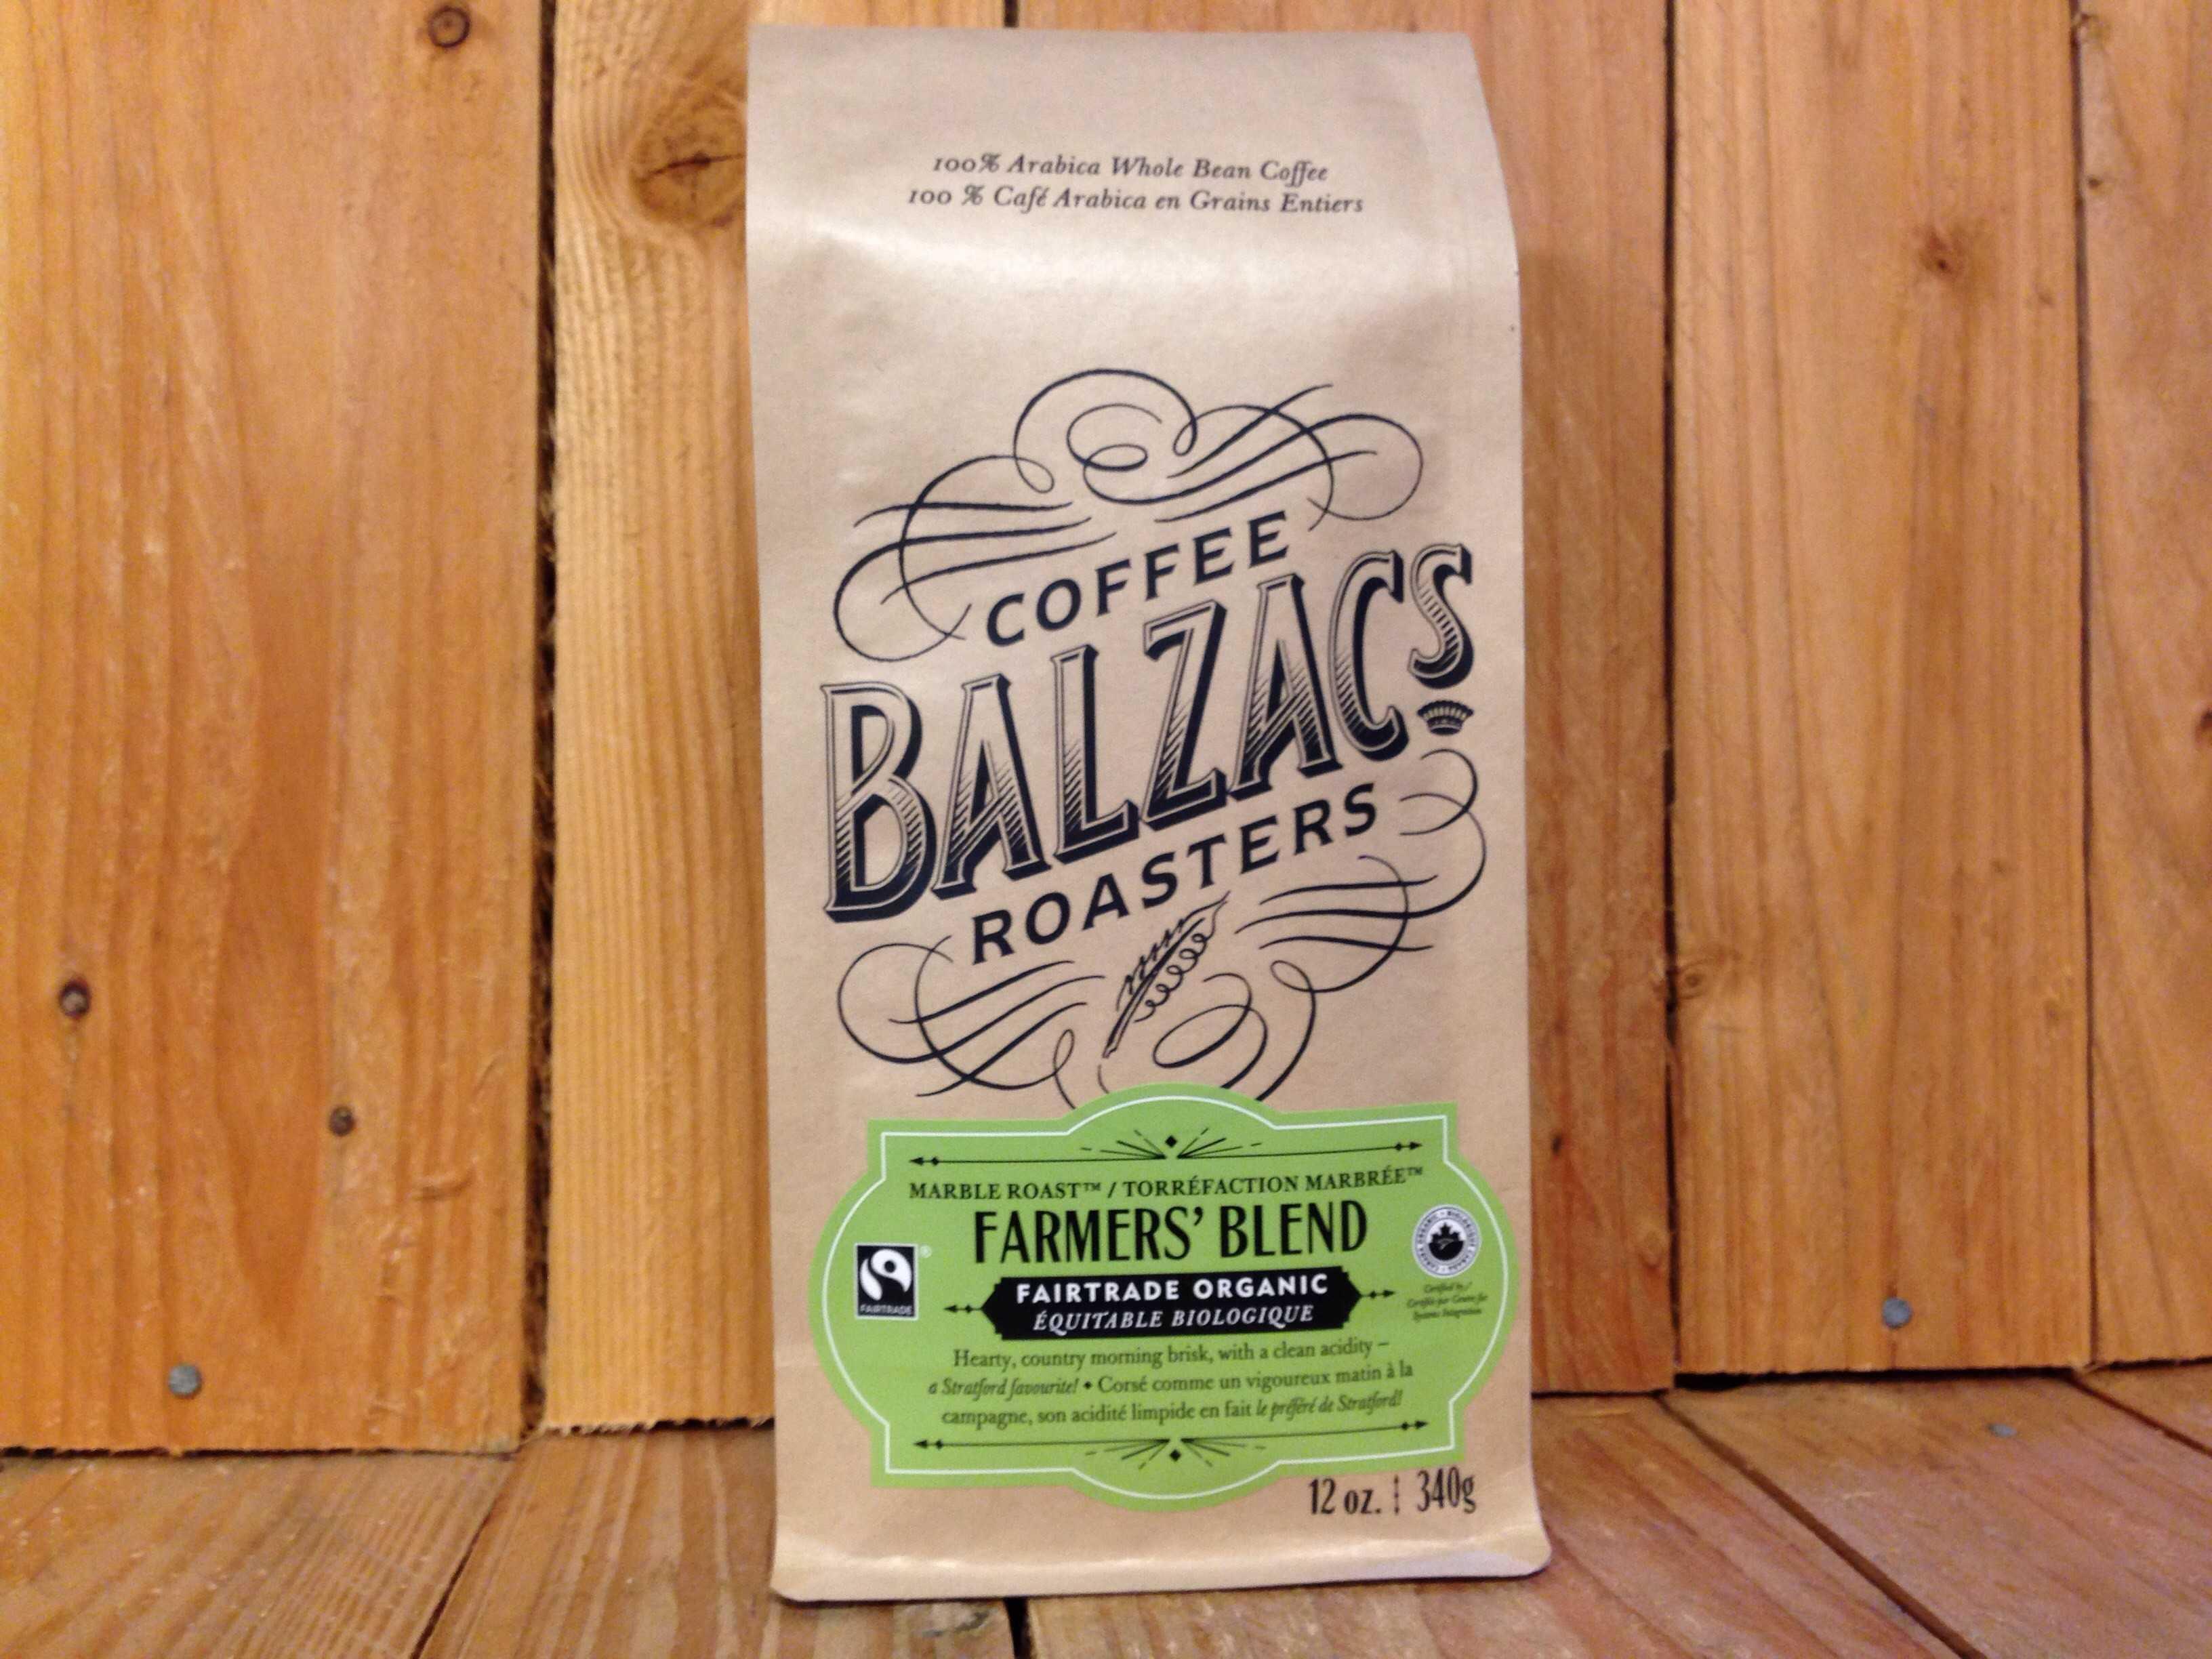 Balzac's Coffee Roasters – Farmer's Blend (340g/Beans)